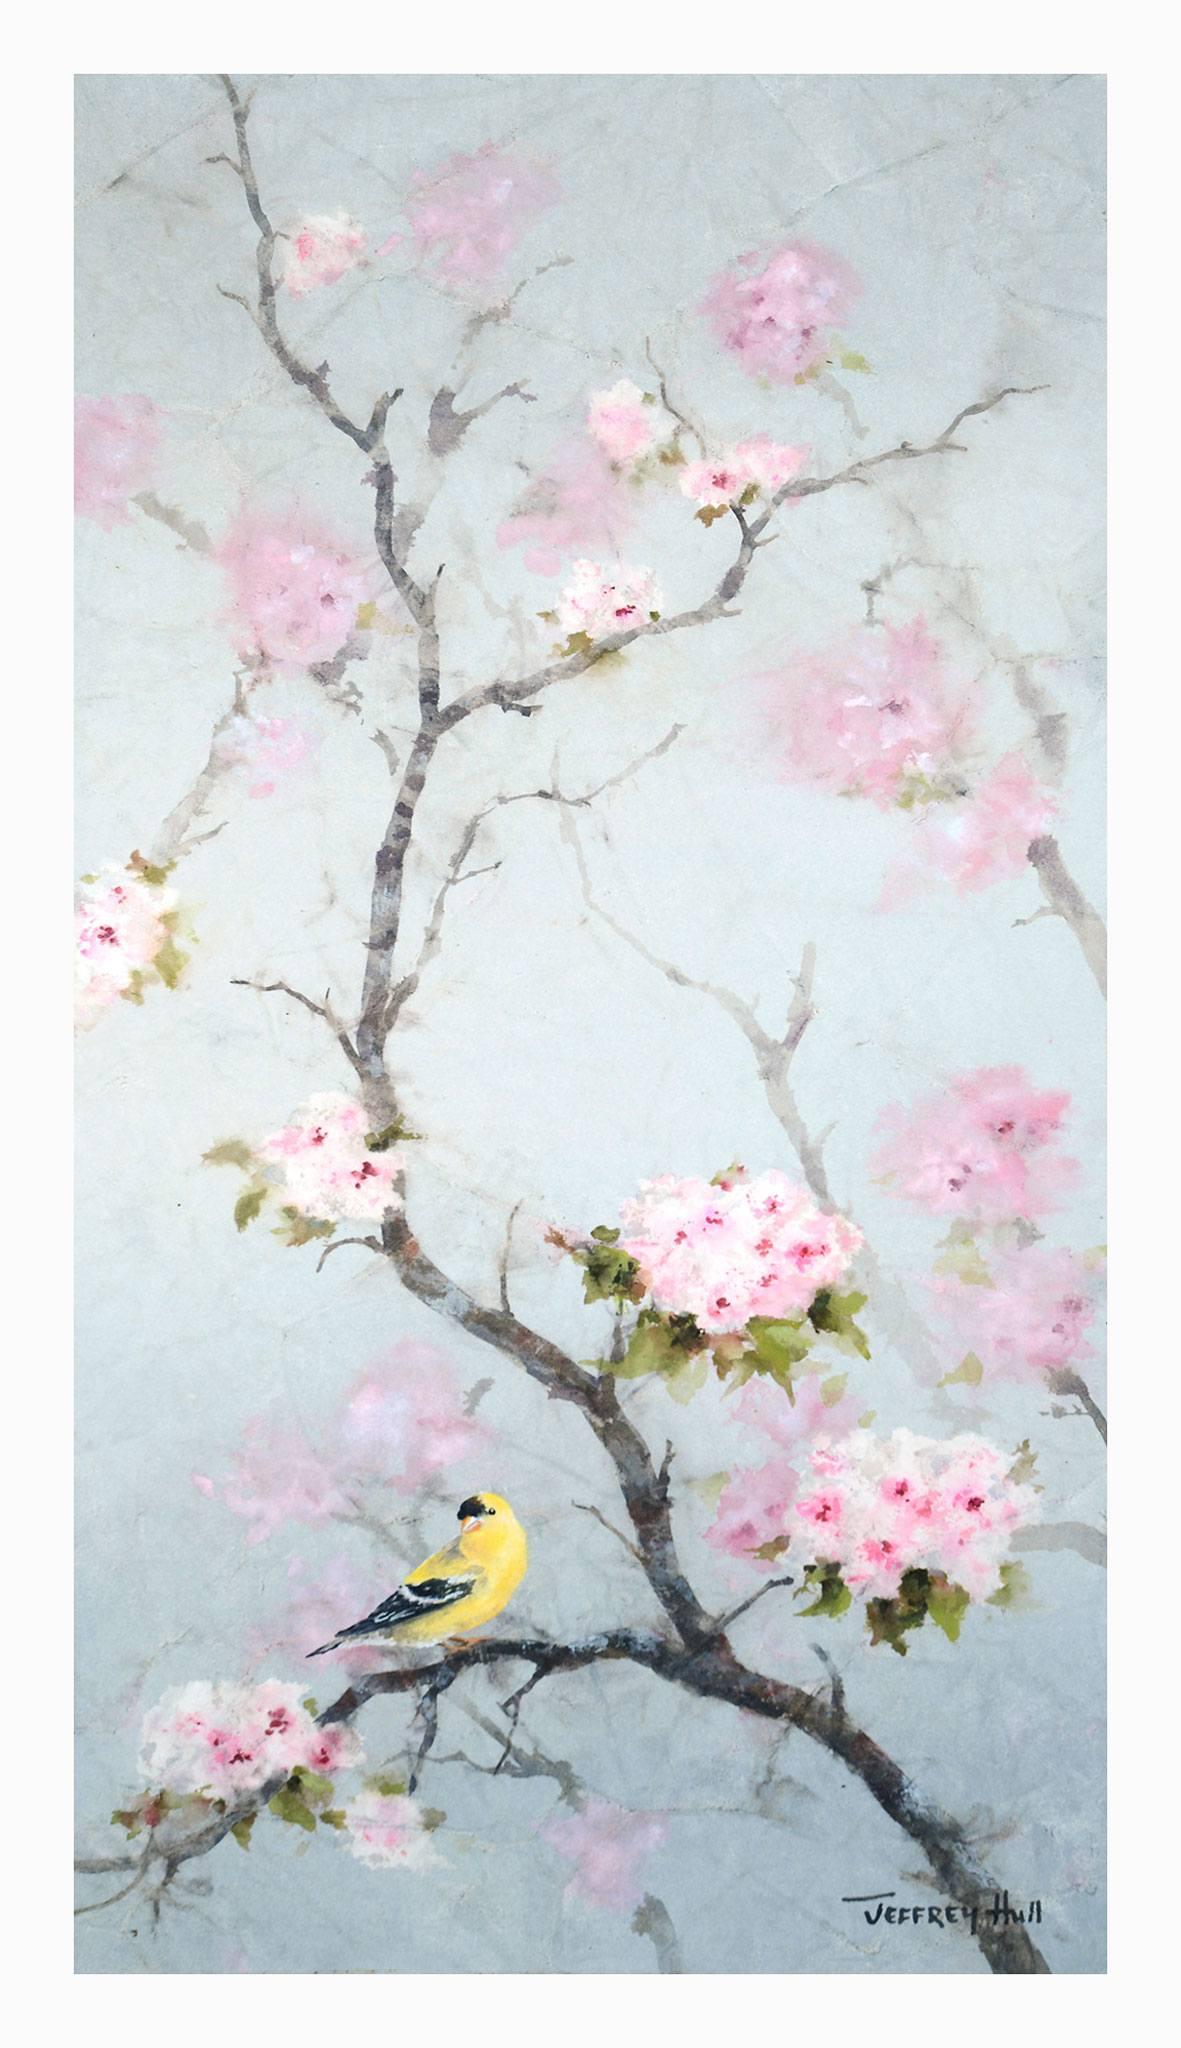 Goldfinch-_-Cherry-Blossoms-LimEd-Unframed-4-Website-2021